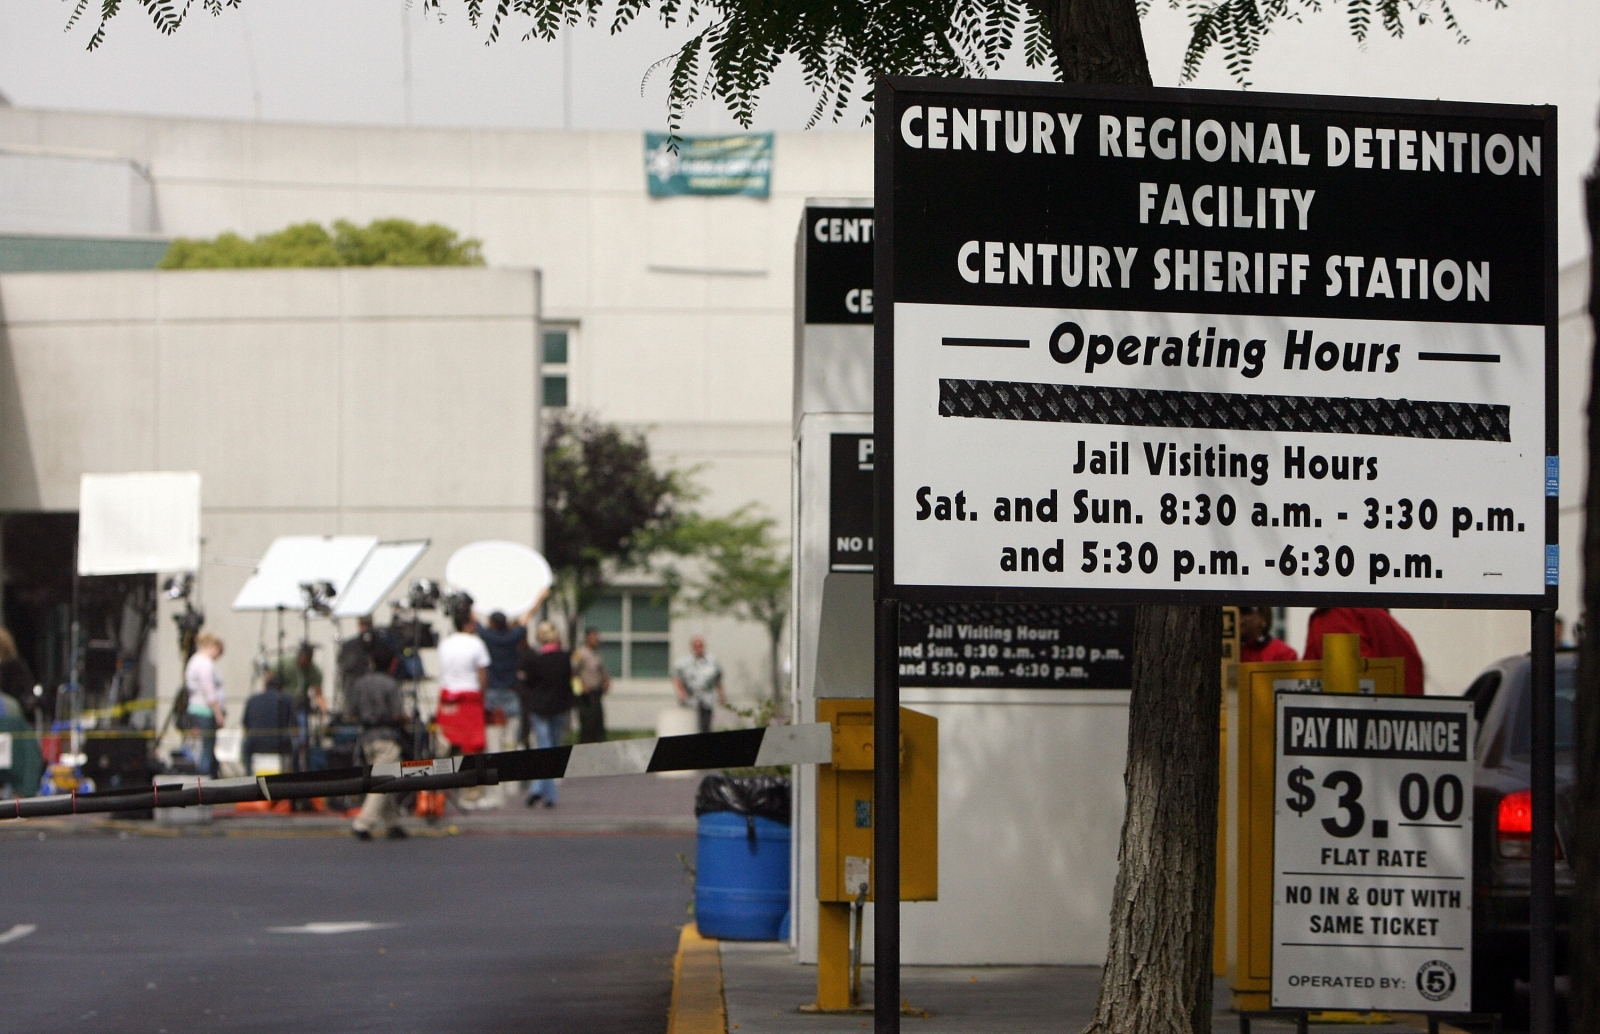 Century Regional Detention Facility